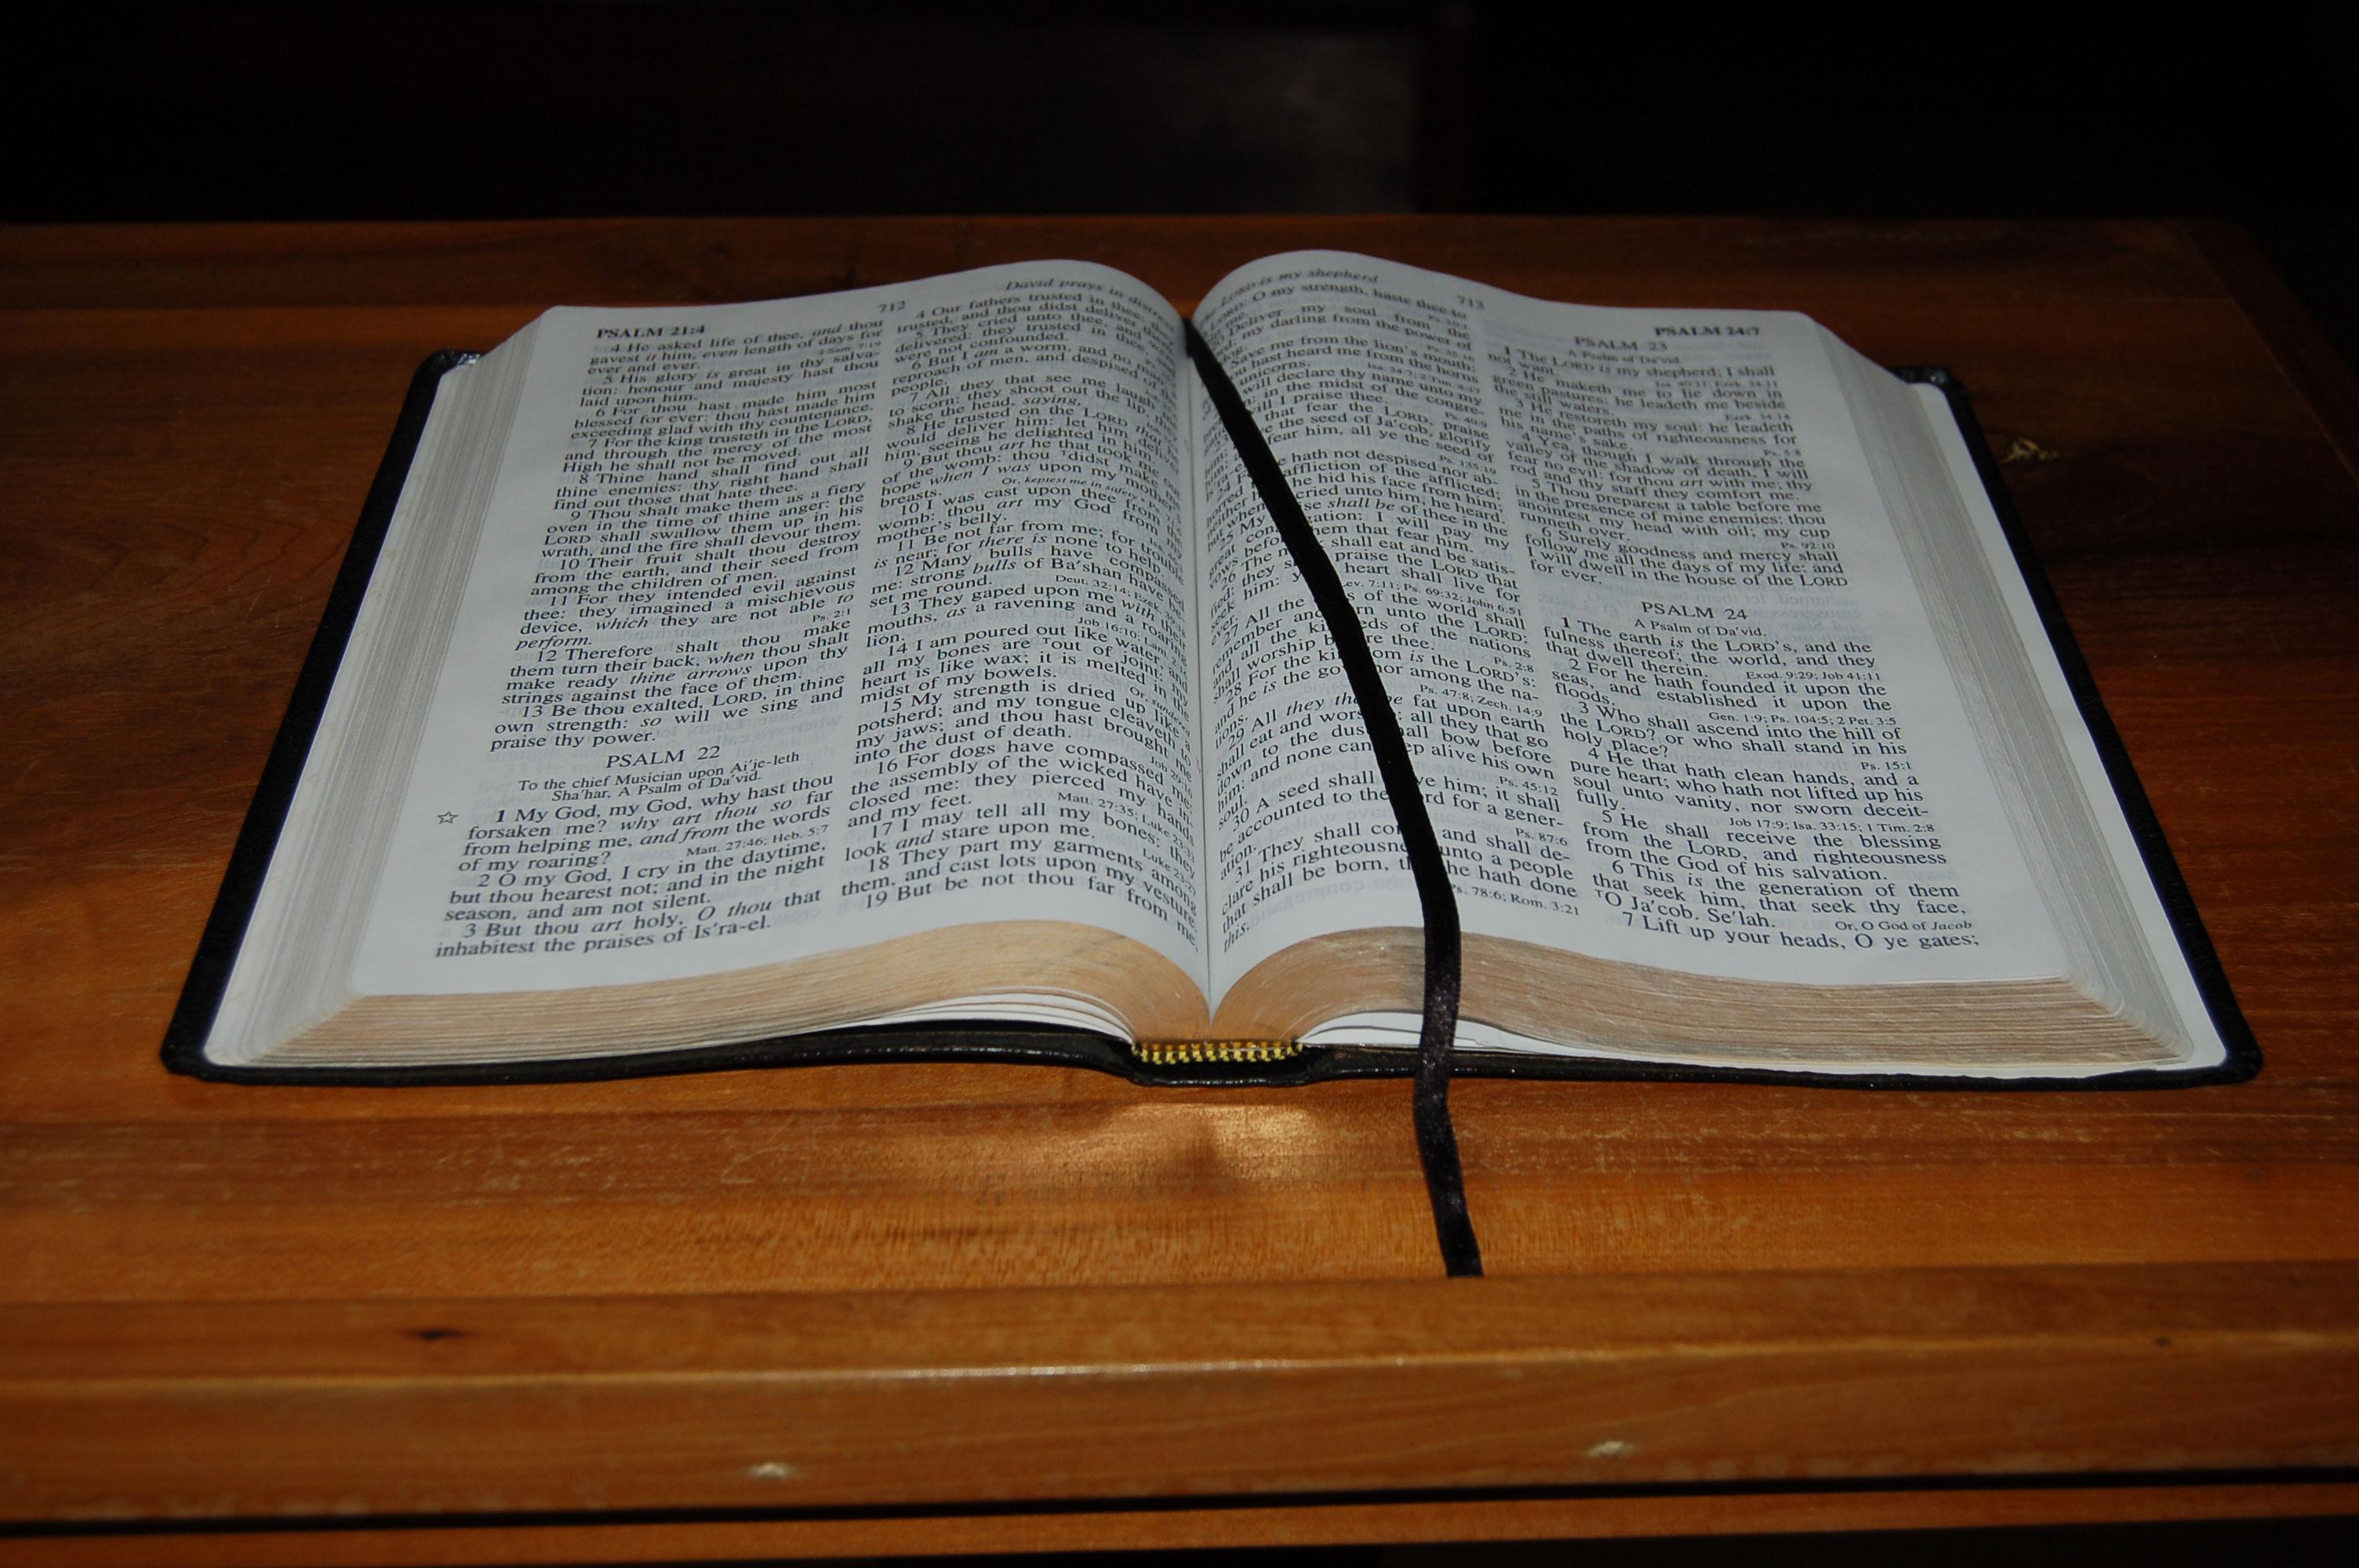 Christian Stock Photos by Linda Bateman - Open Bible on Wood Table